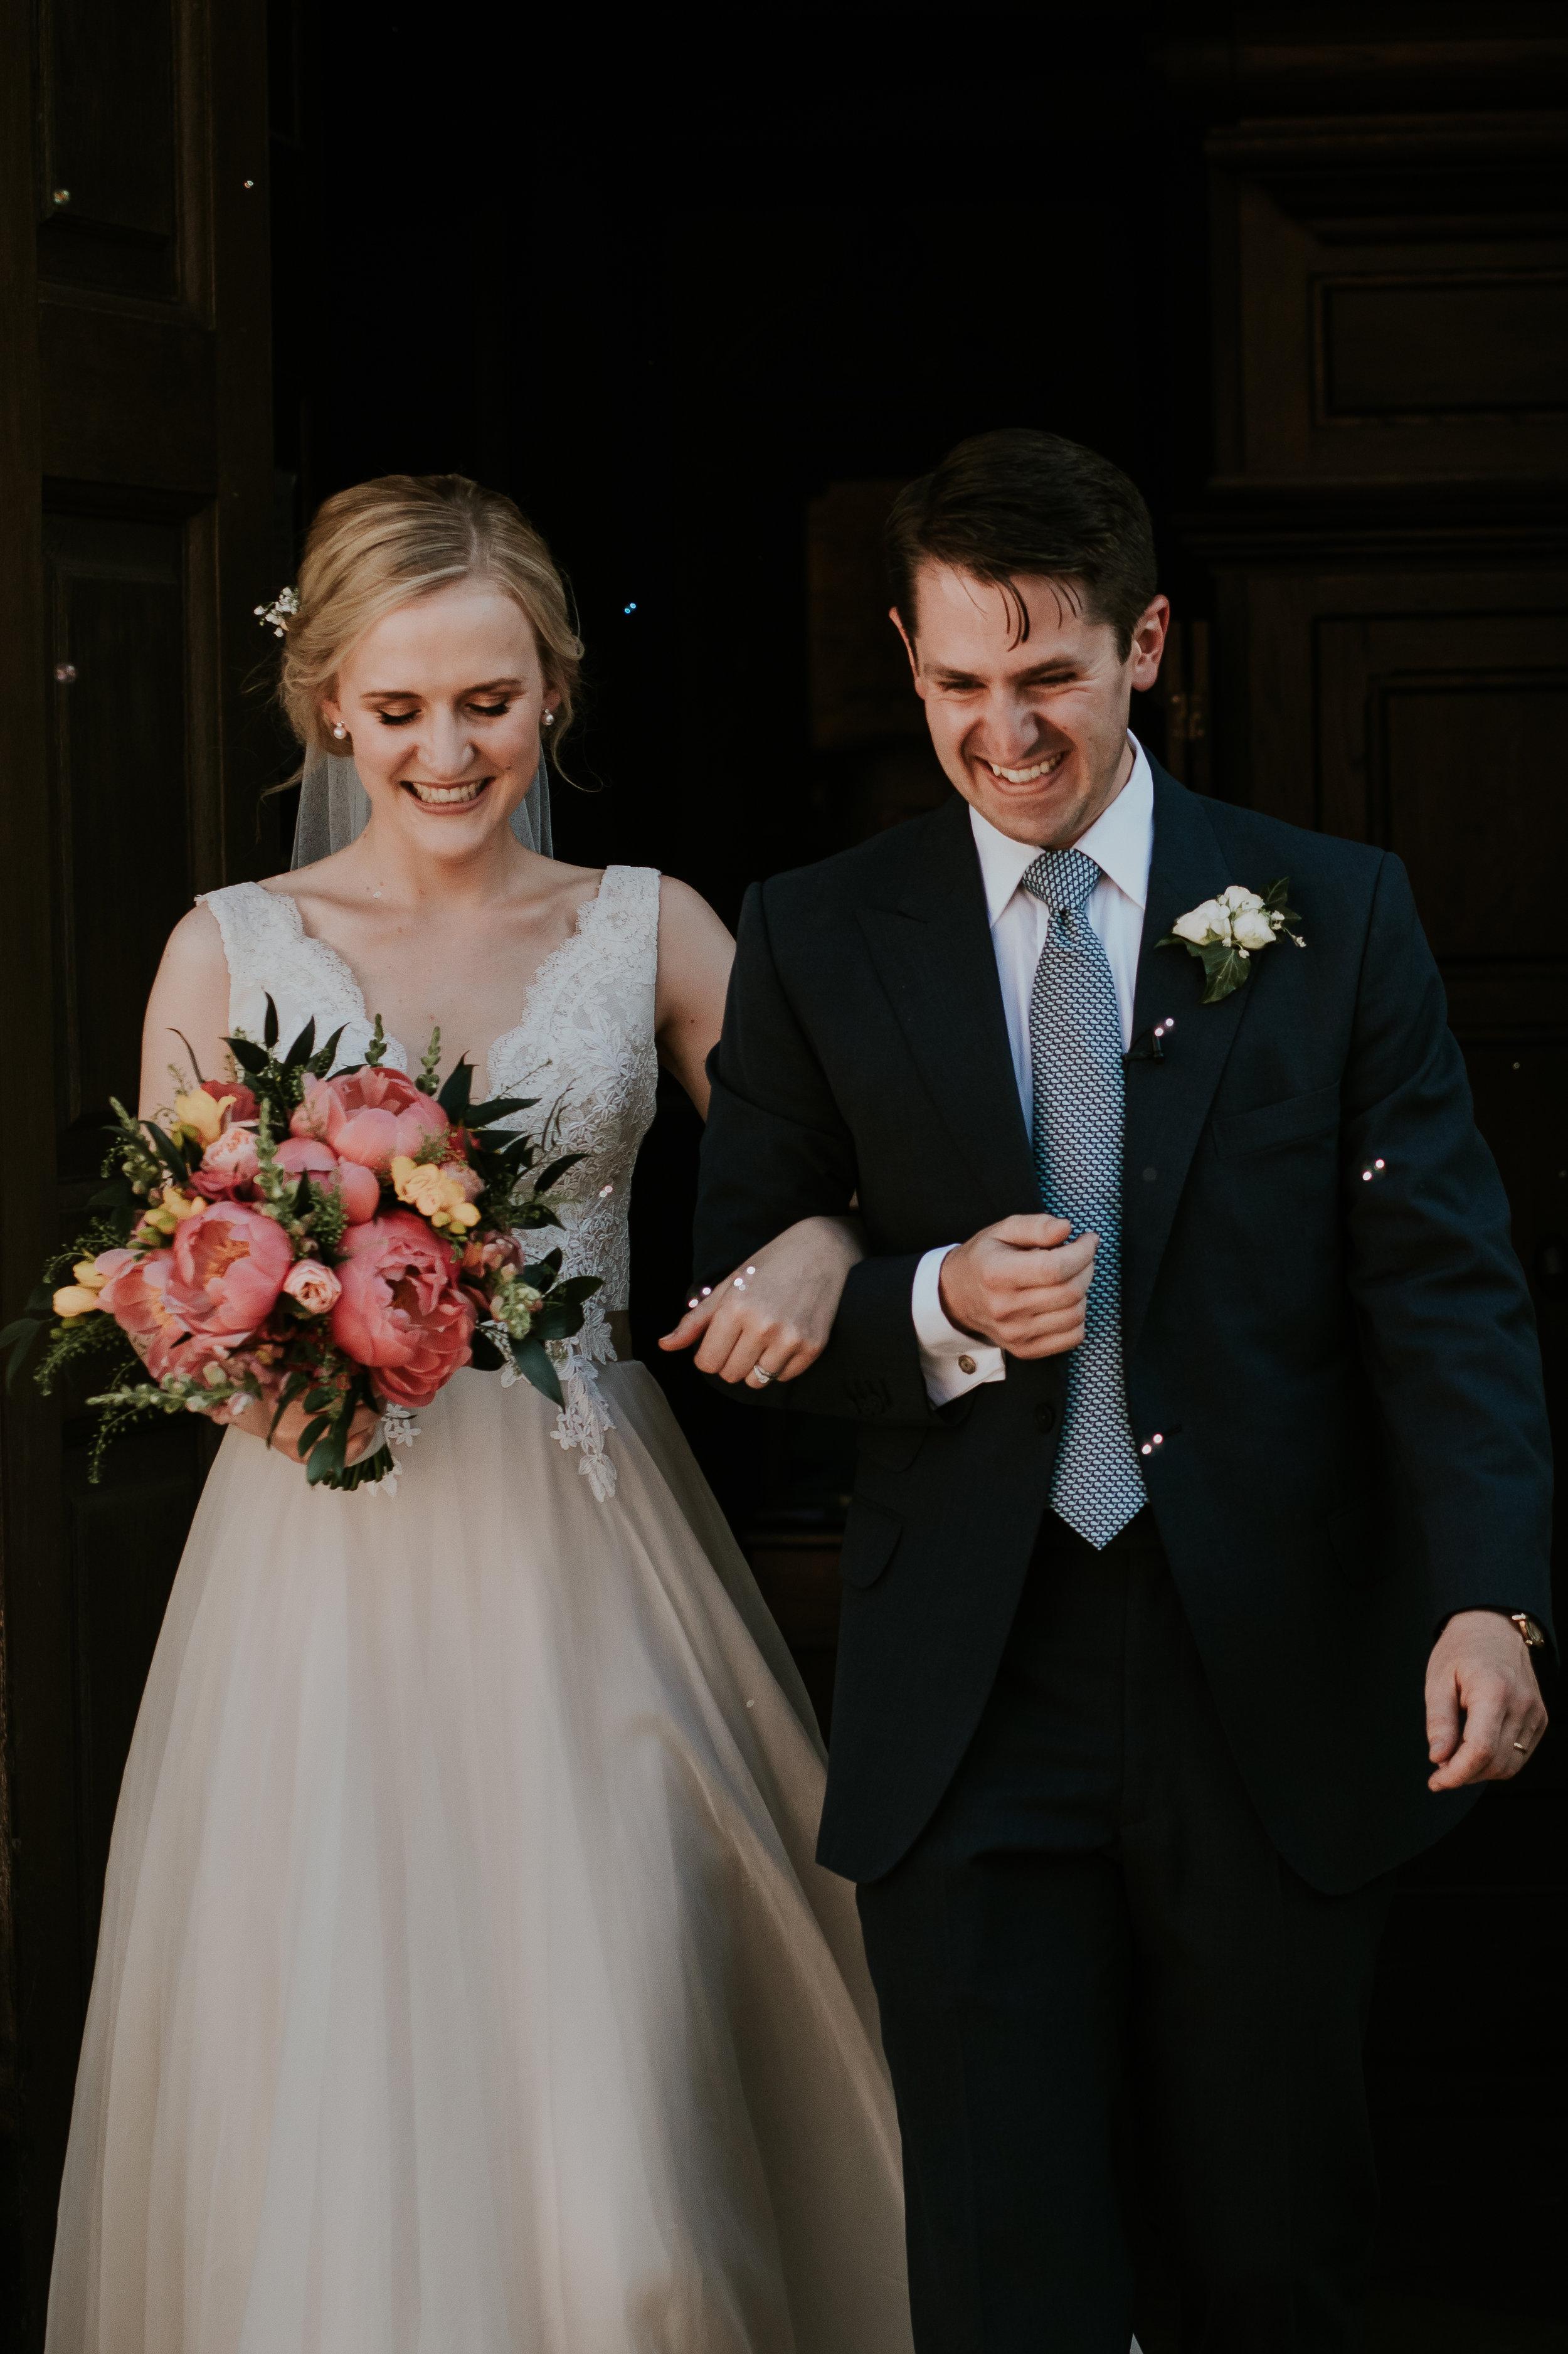 sam-andrew-wedding-pembroke-bodleian-kelechianna-70.jpg